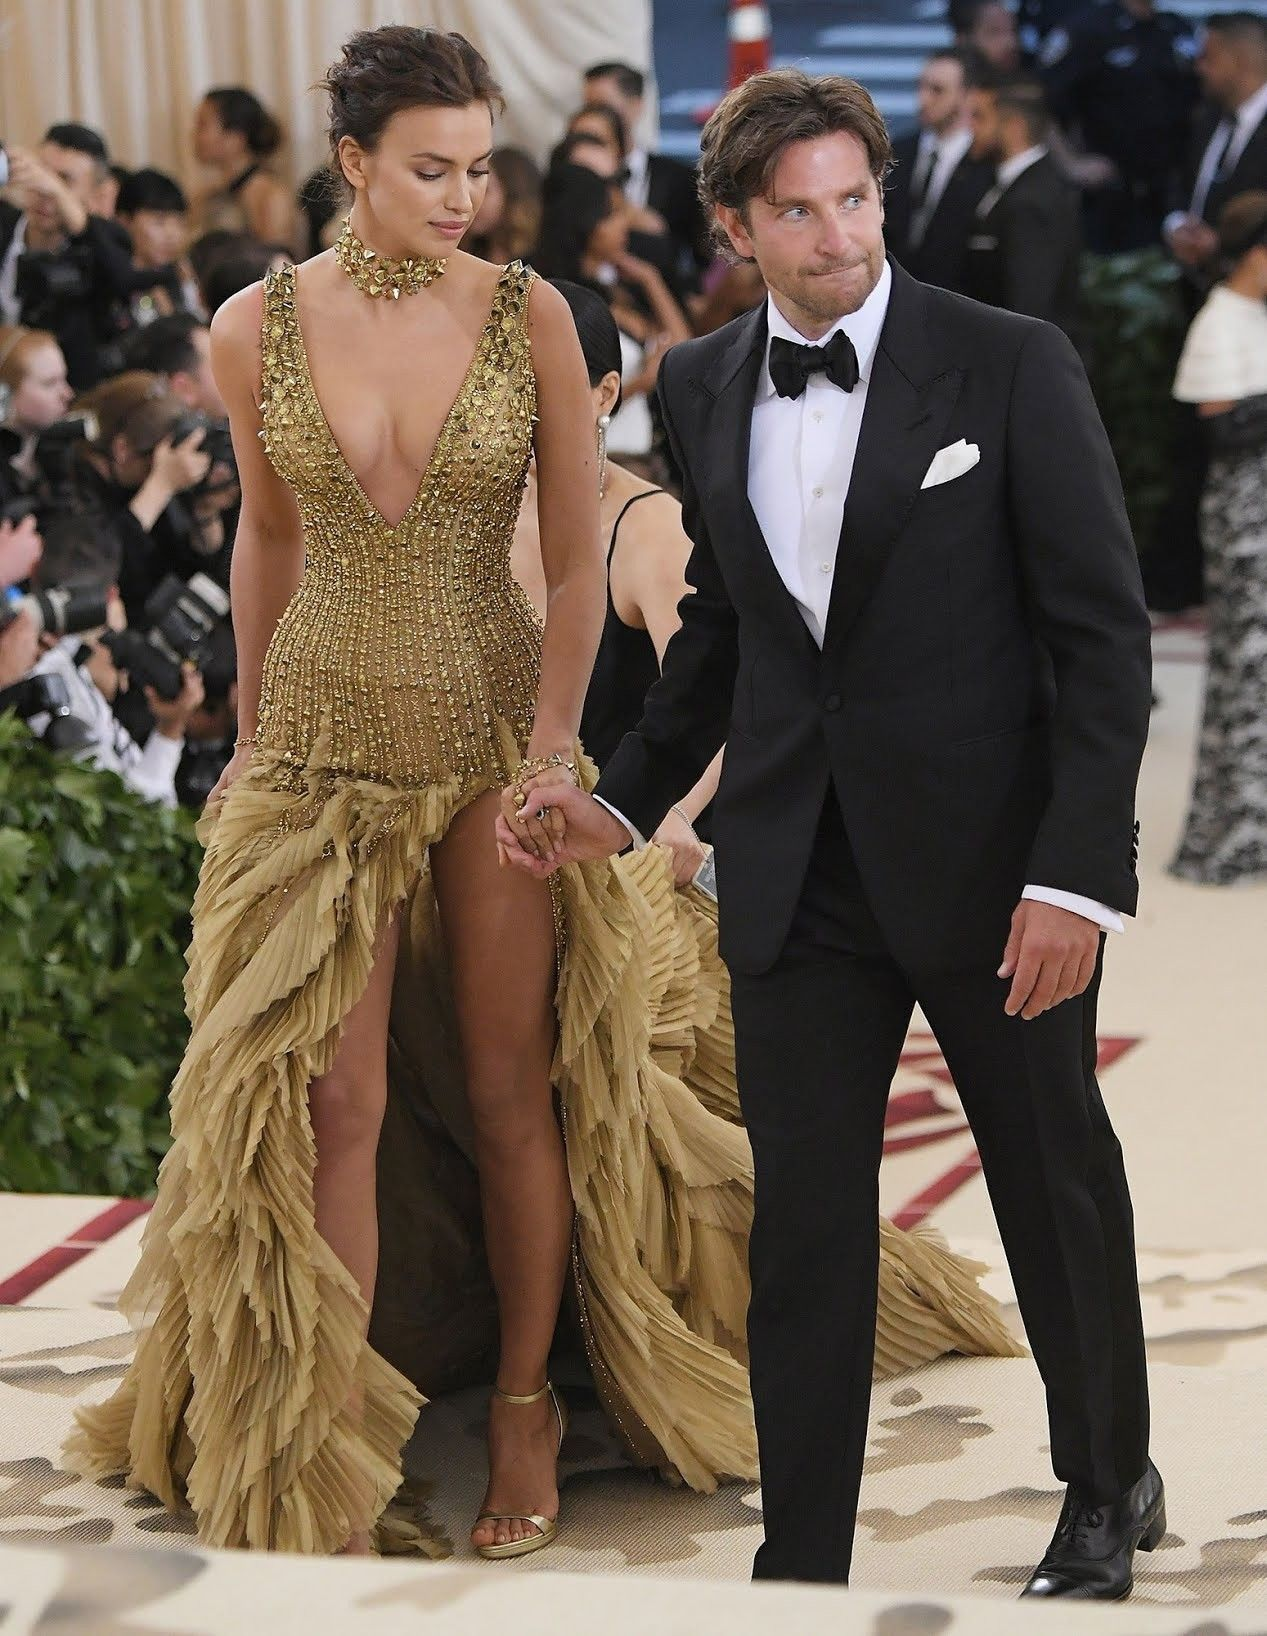 Irina Shayk and Bradley Cooper are preparing for the wedding